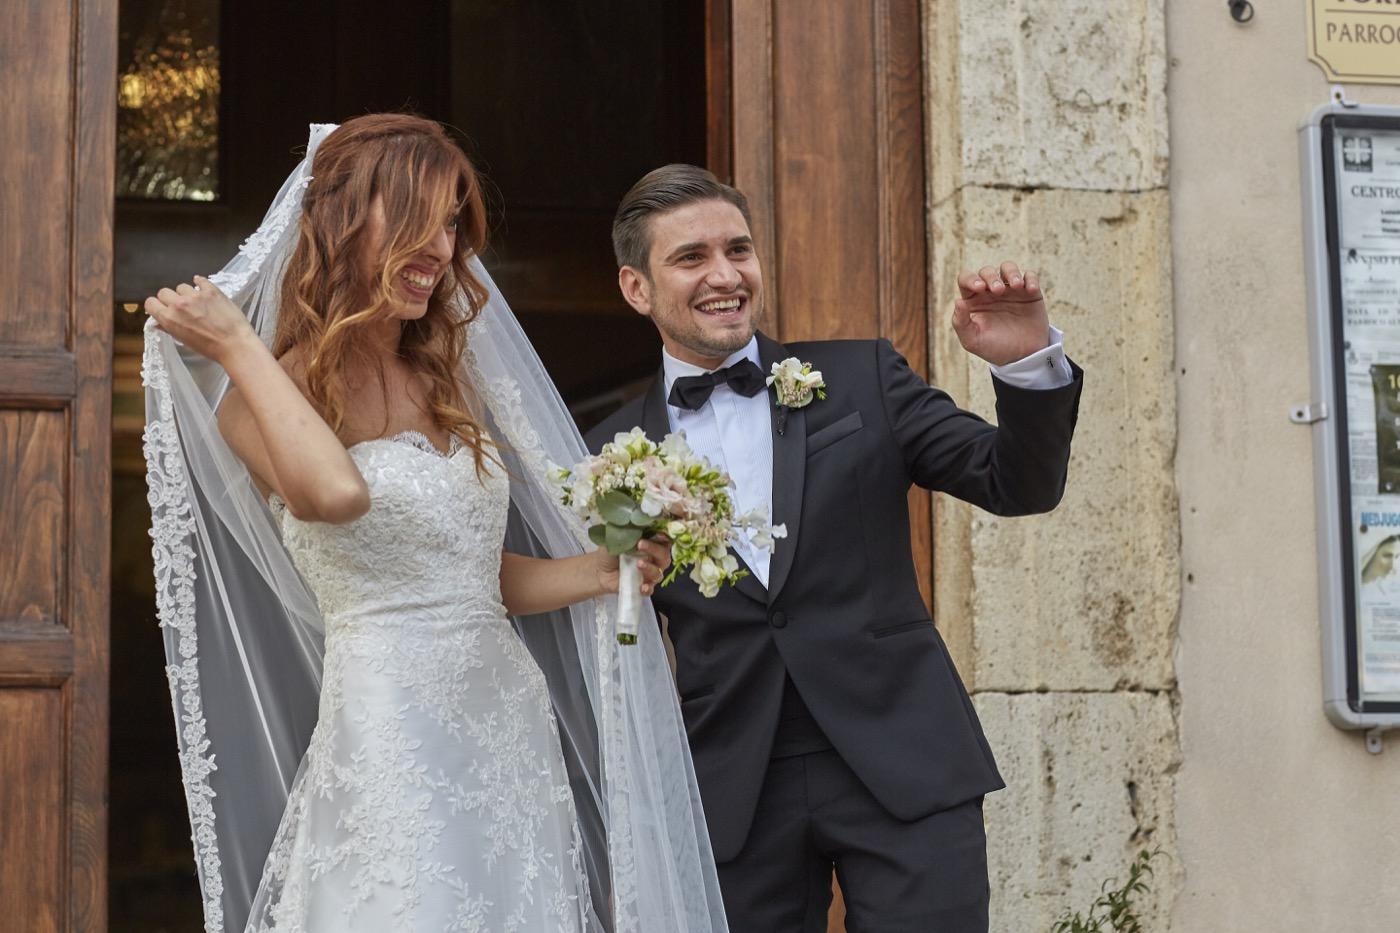 Claudio-Coppola-wedding-photographer-abbazia-7-frati-piegaro-56